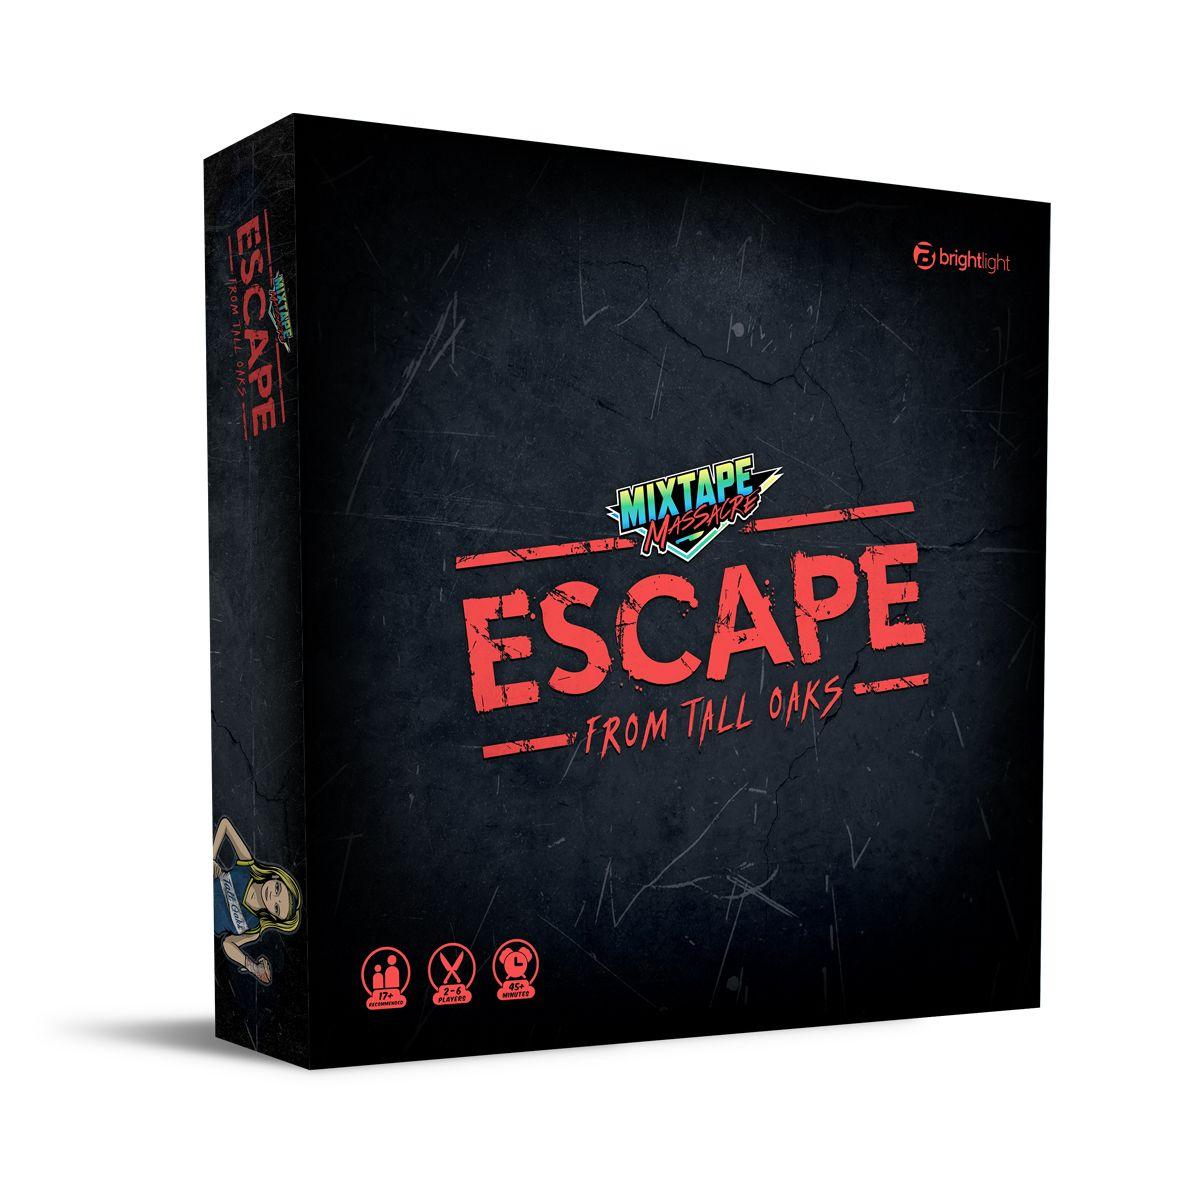 Mixtape Massacre: Escape From Tall Oaks